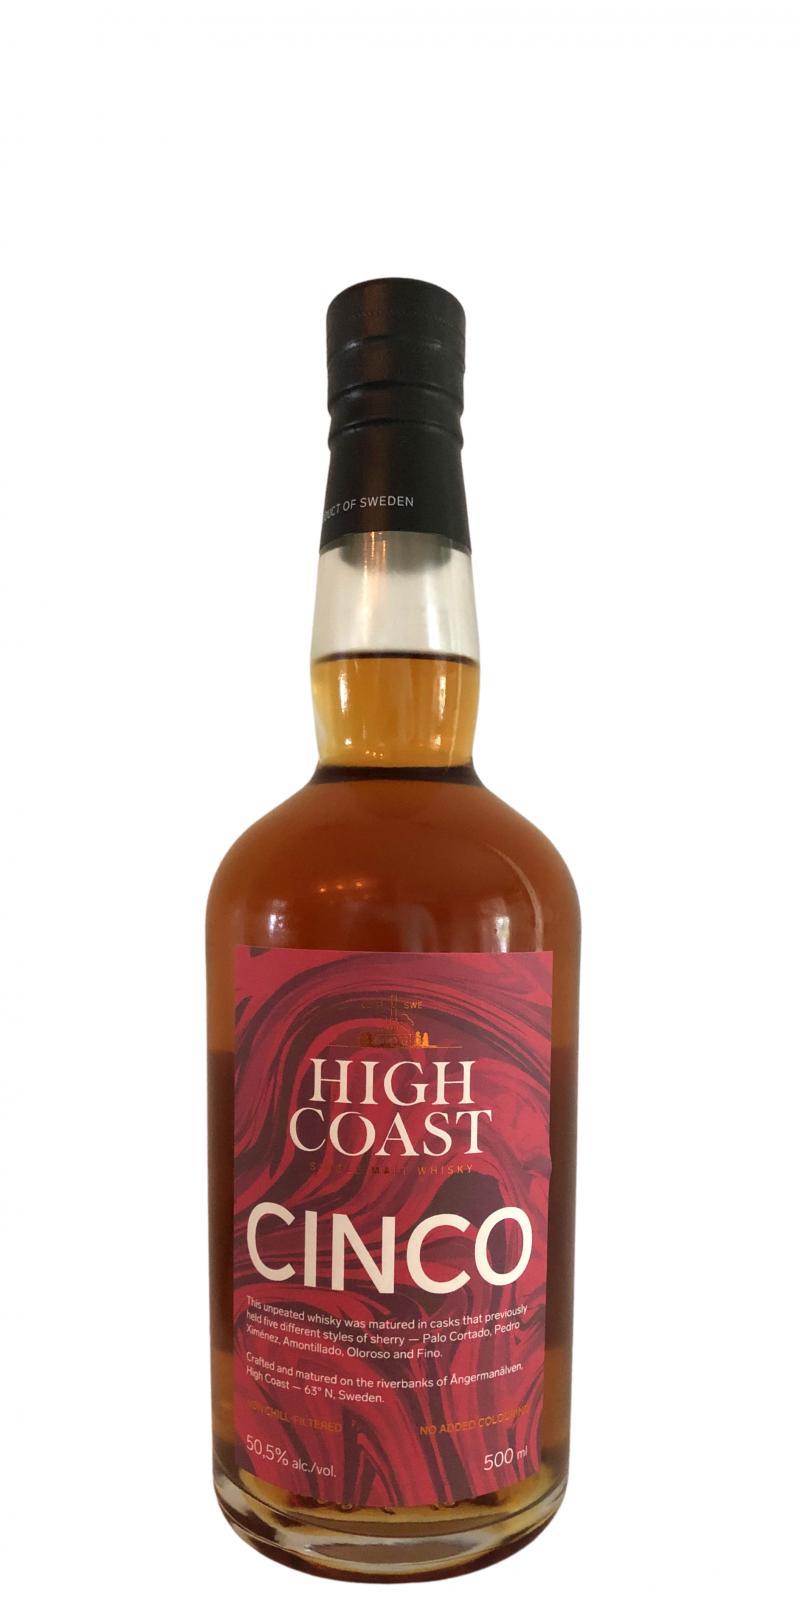 High Coast Cinco